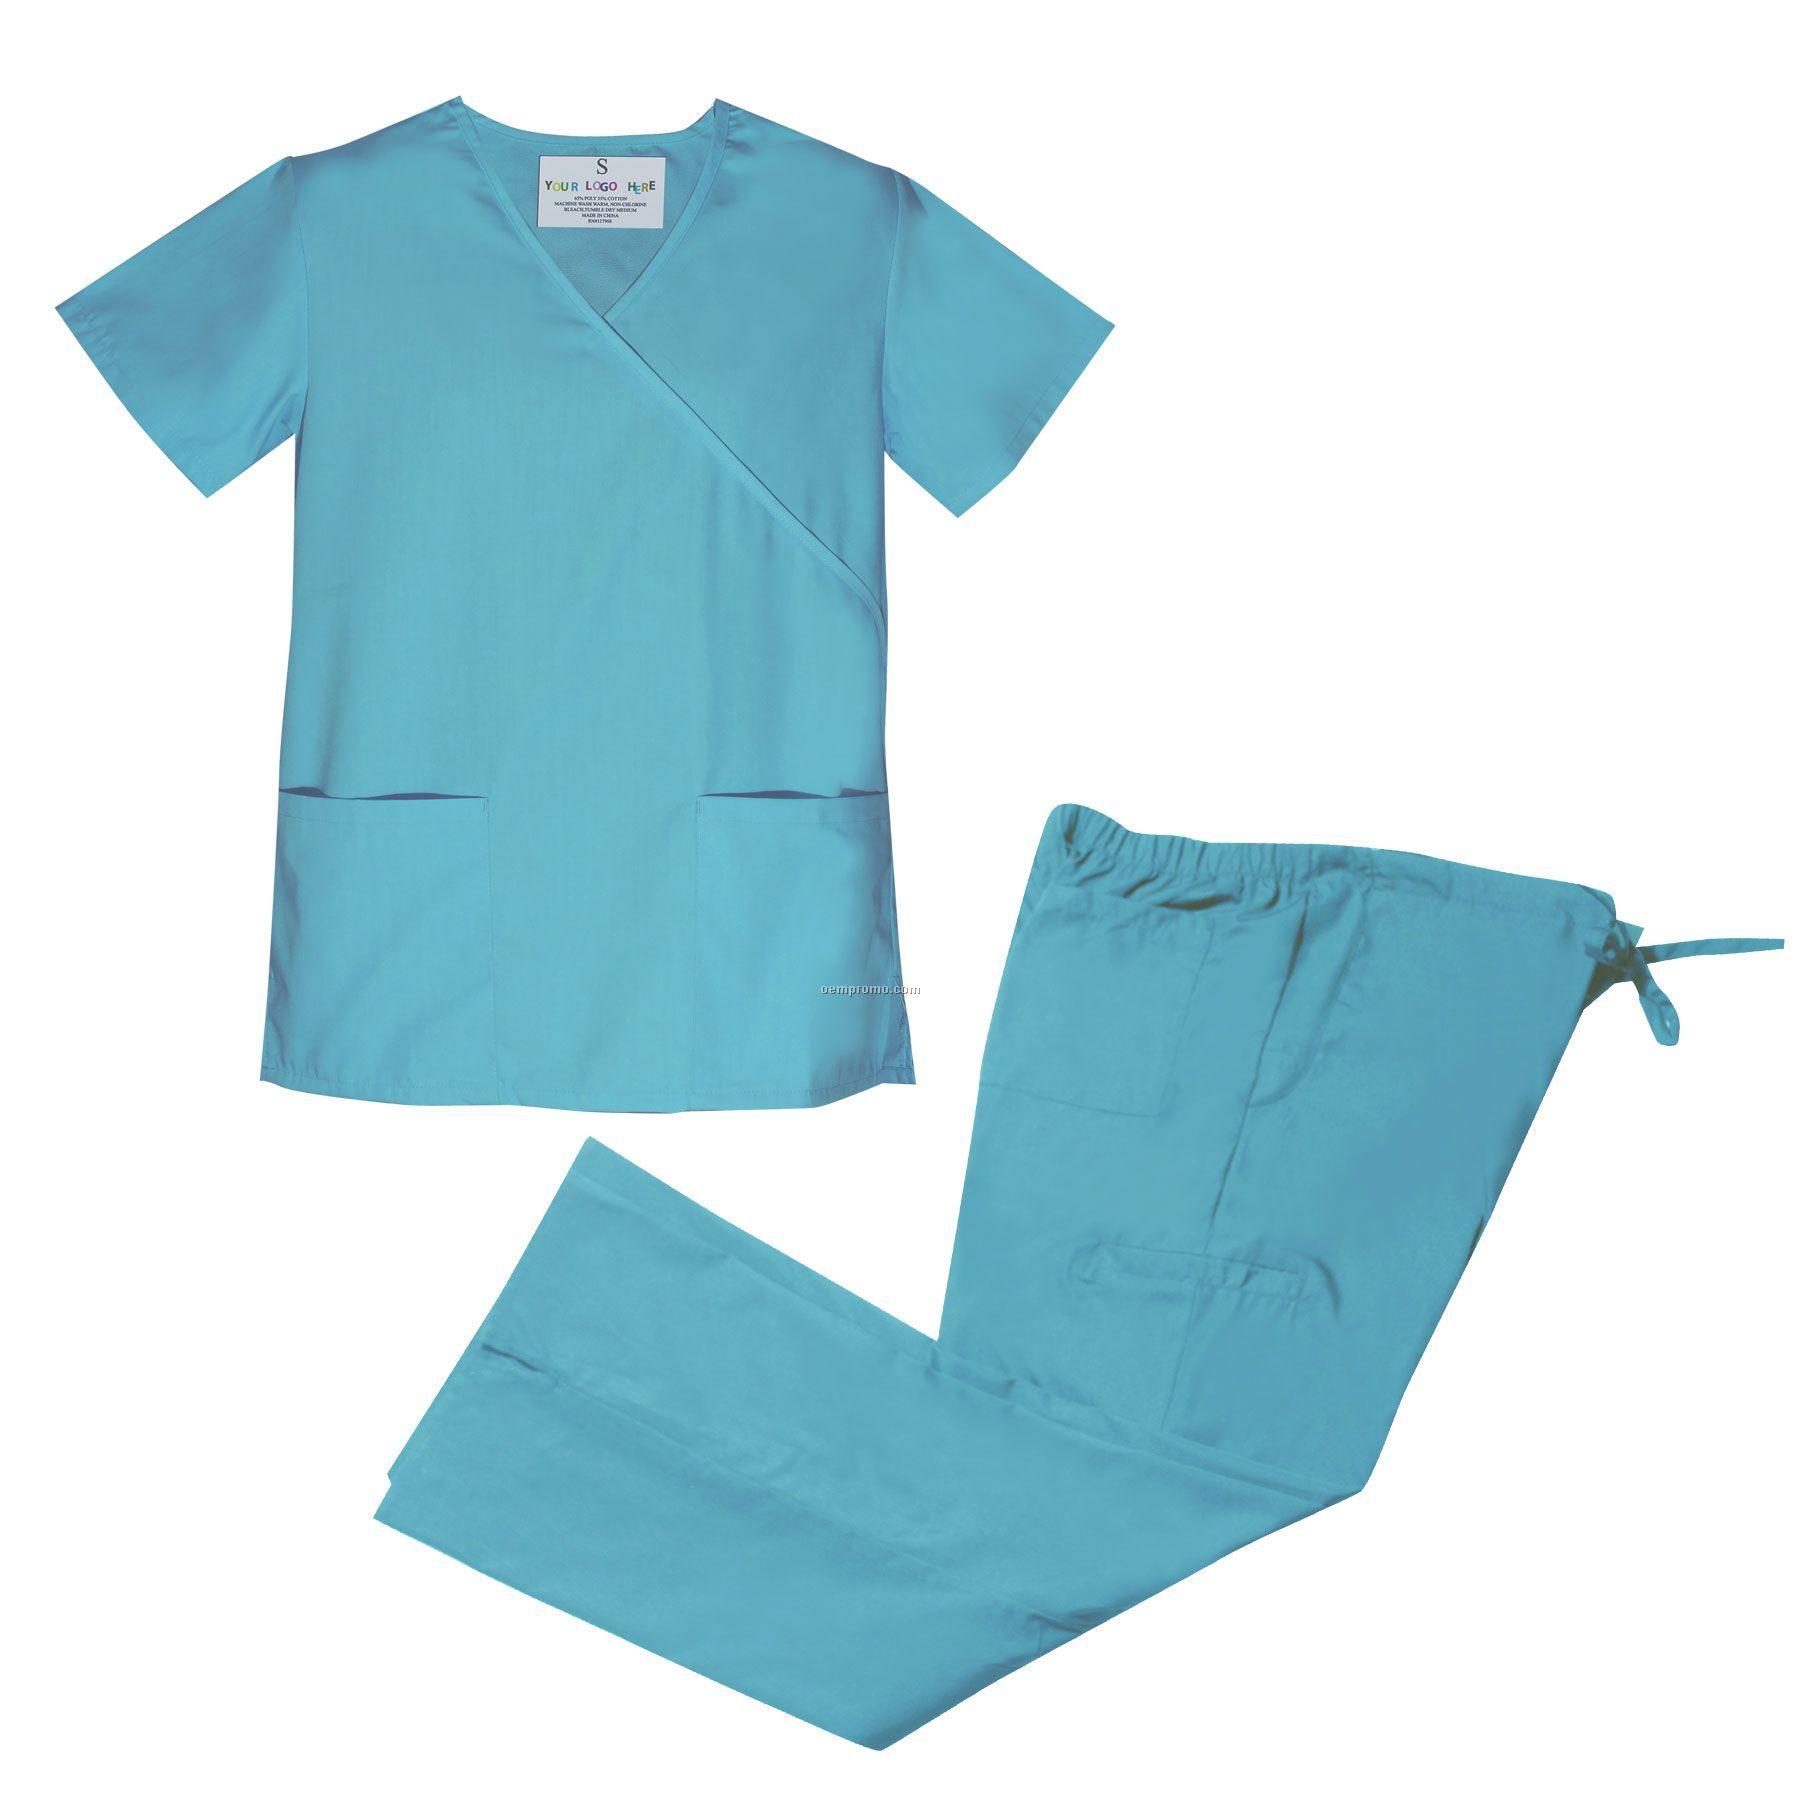 Clipart scrubs banner Free Scrubs Pants Cliparts, Download Free Clip Art, Free Clip Art on ... banner